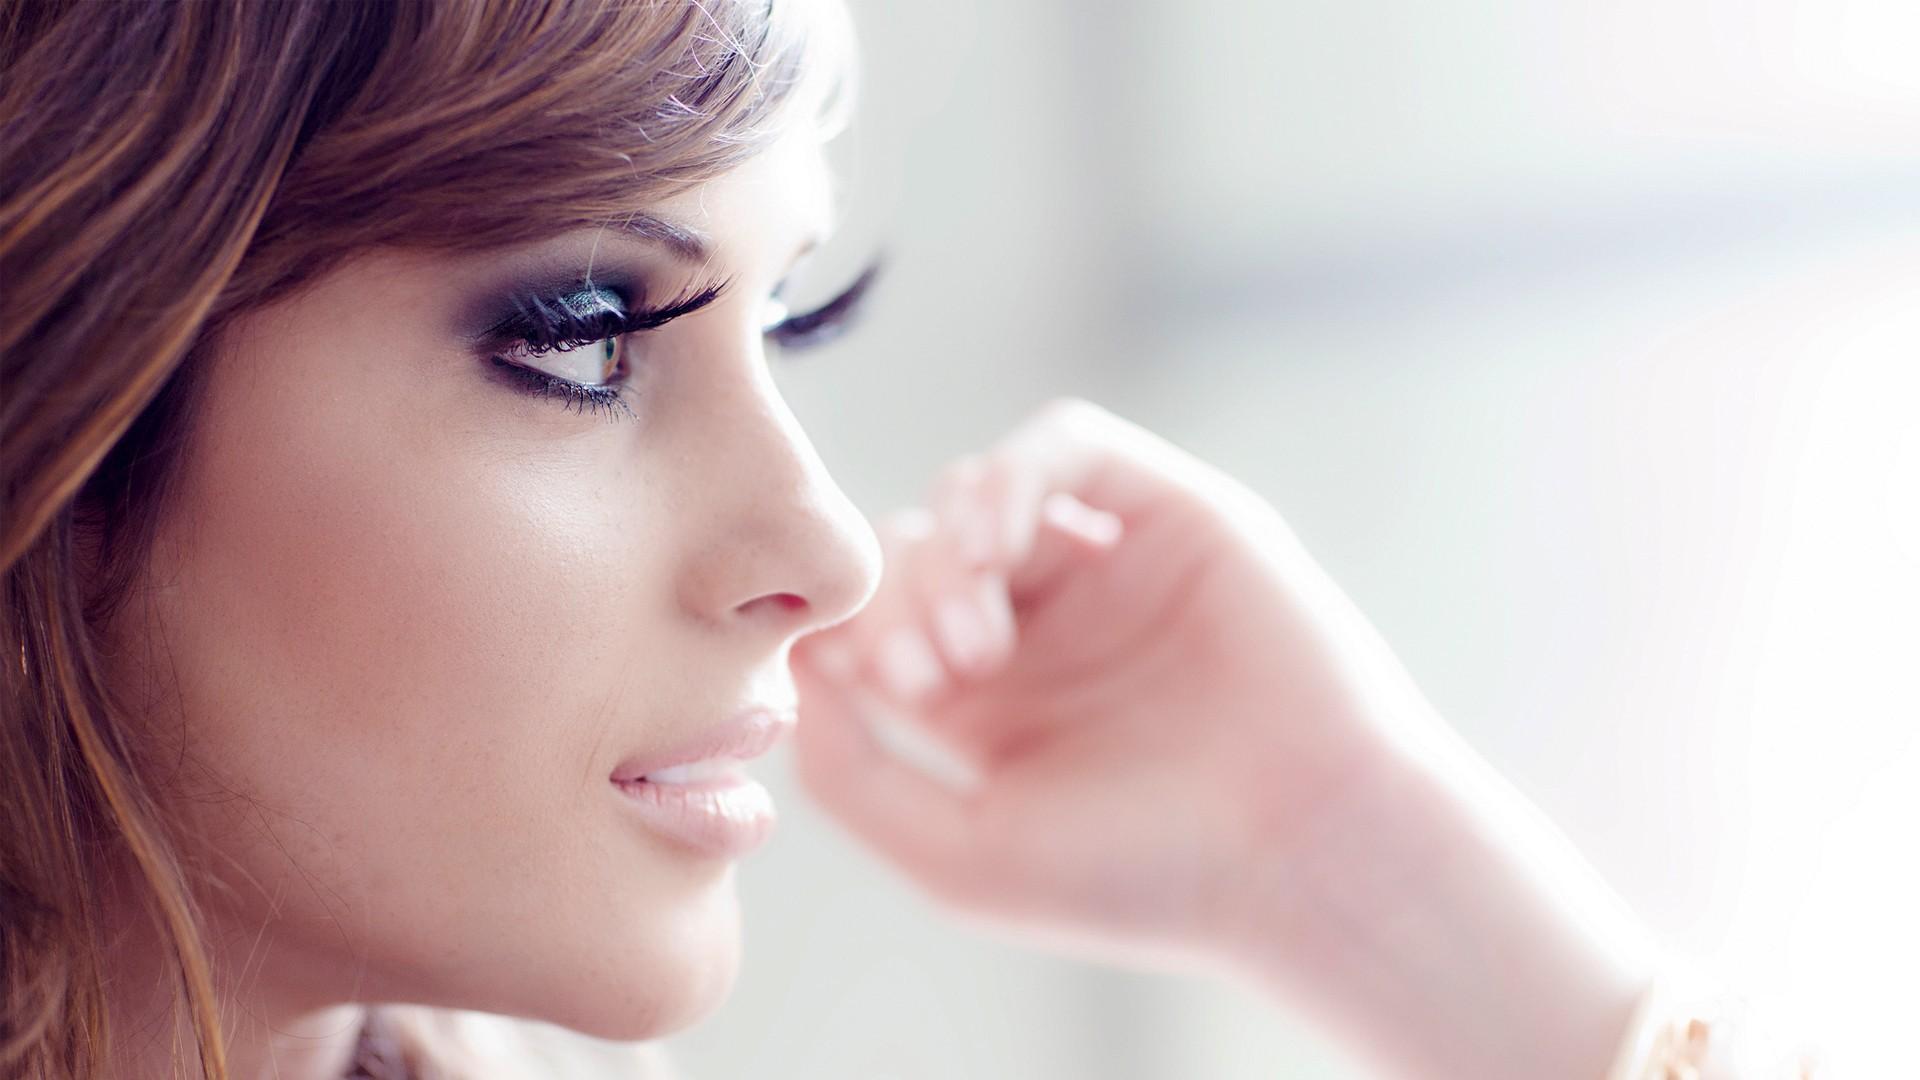 Wallpaper Face White Women Model Hands Glasses Makeup Mouth